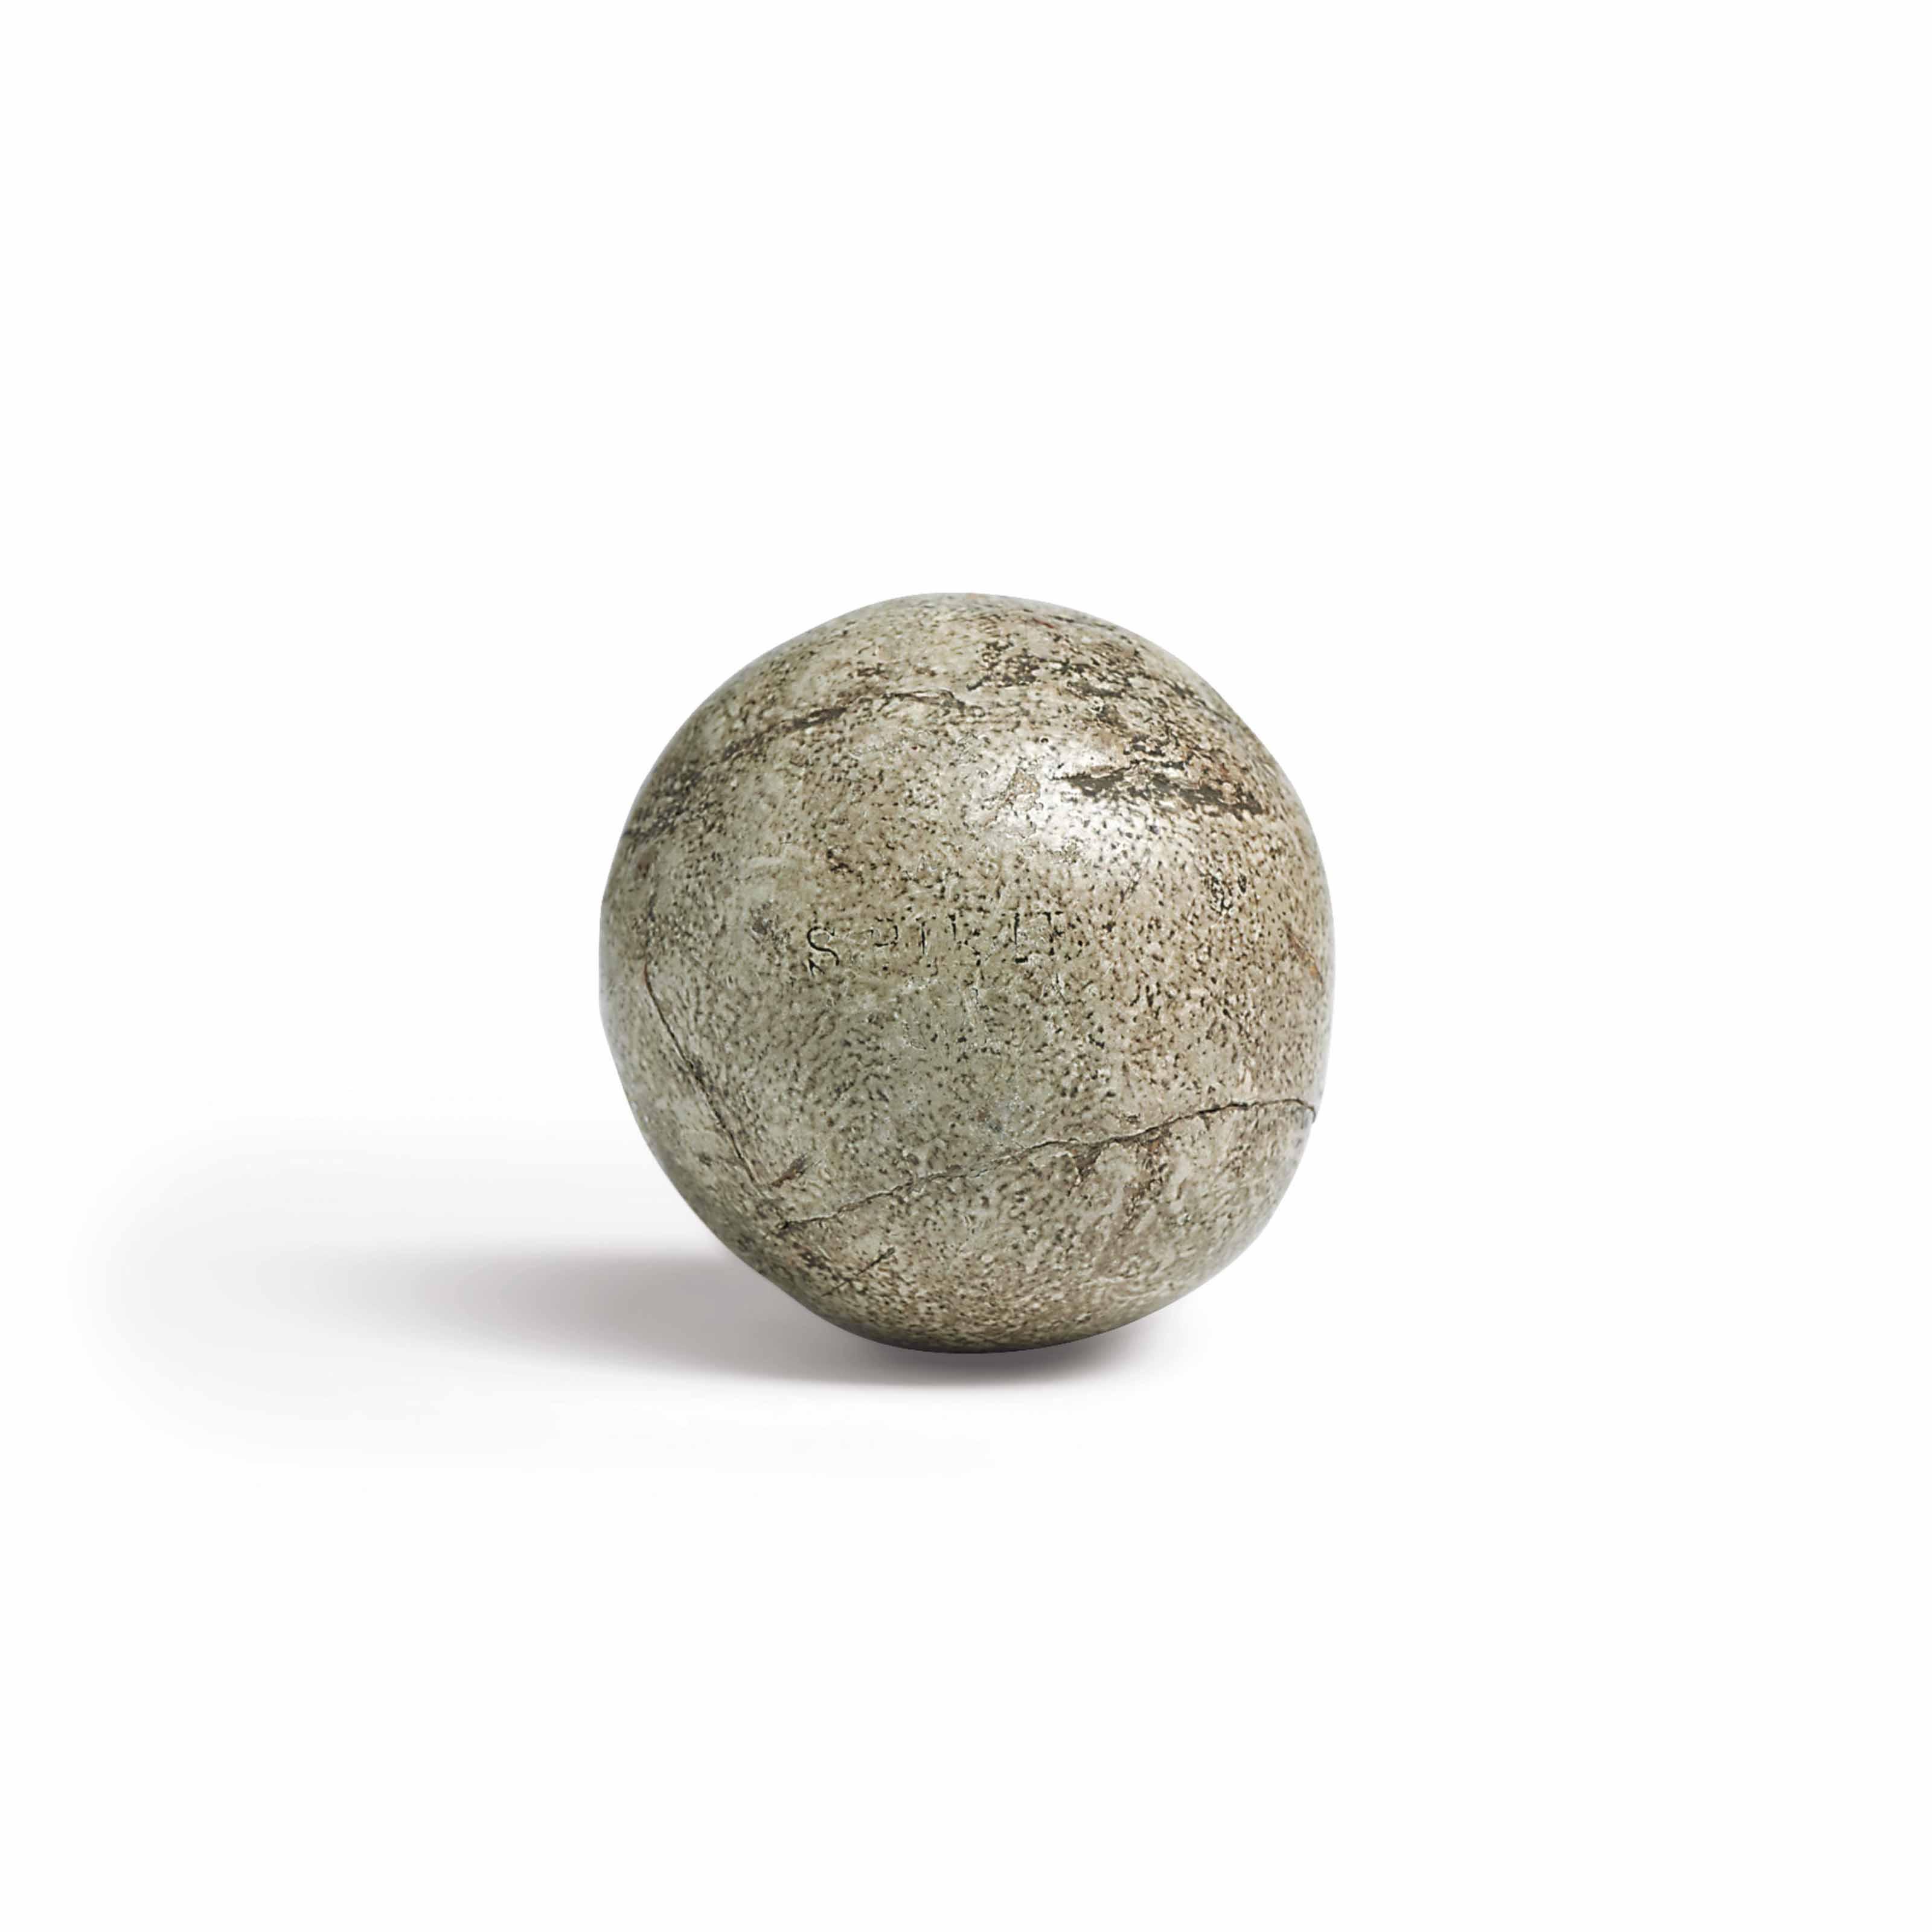 A FINE FEATHER-FILLED GOLF BALL